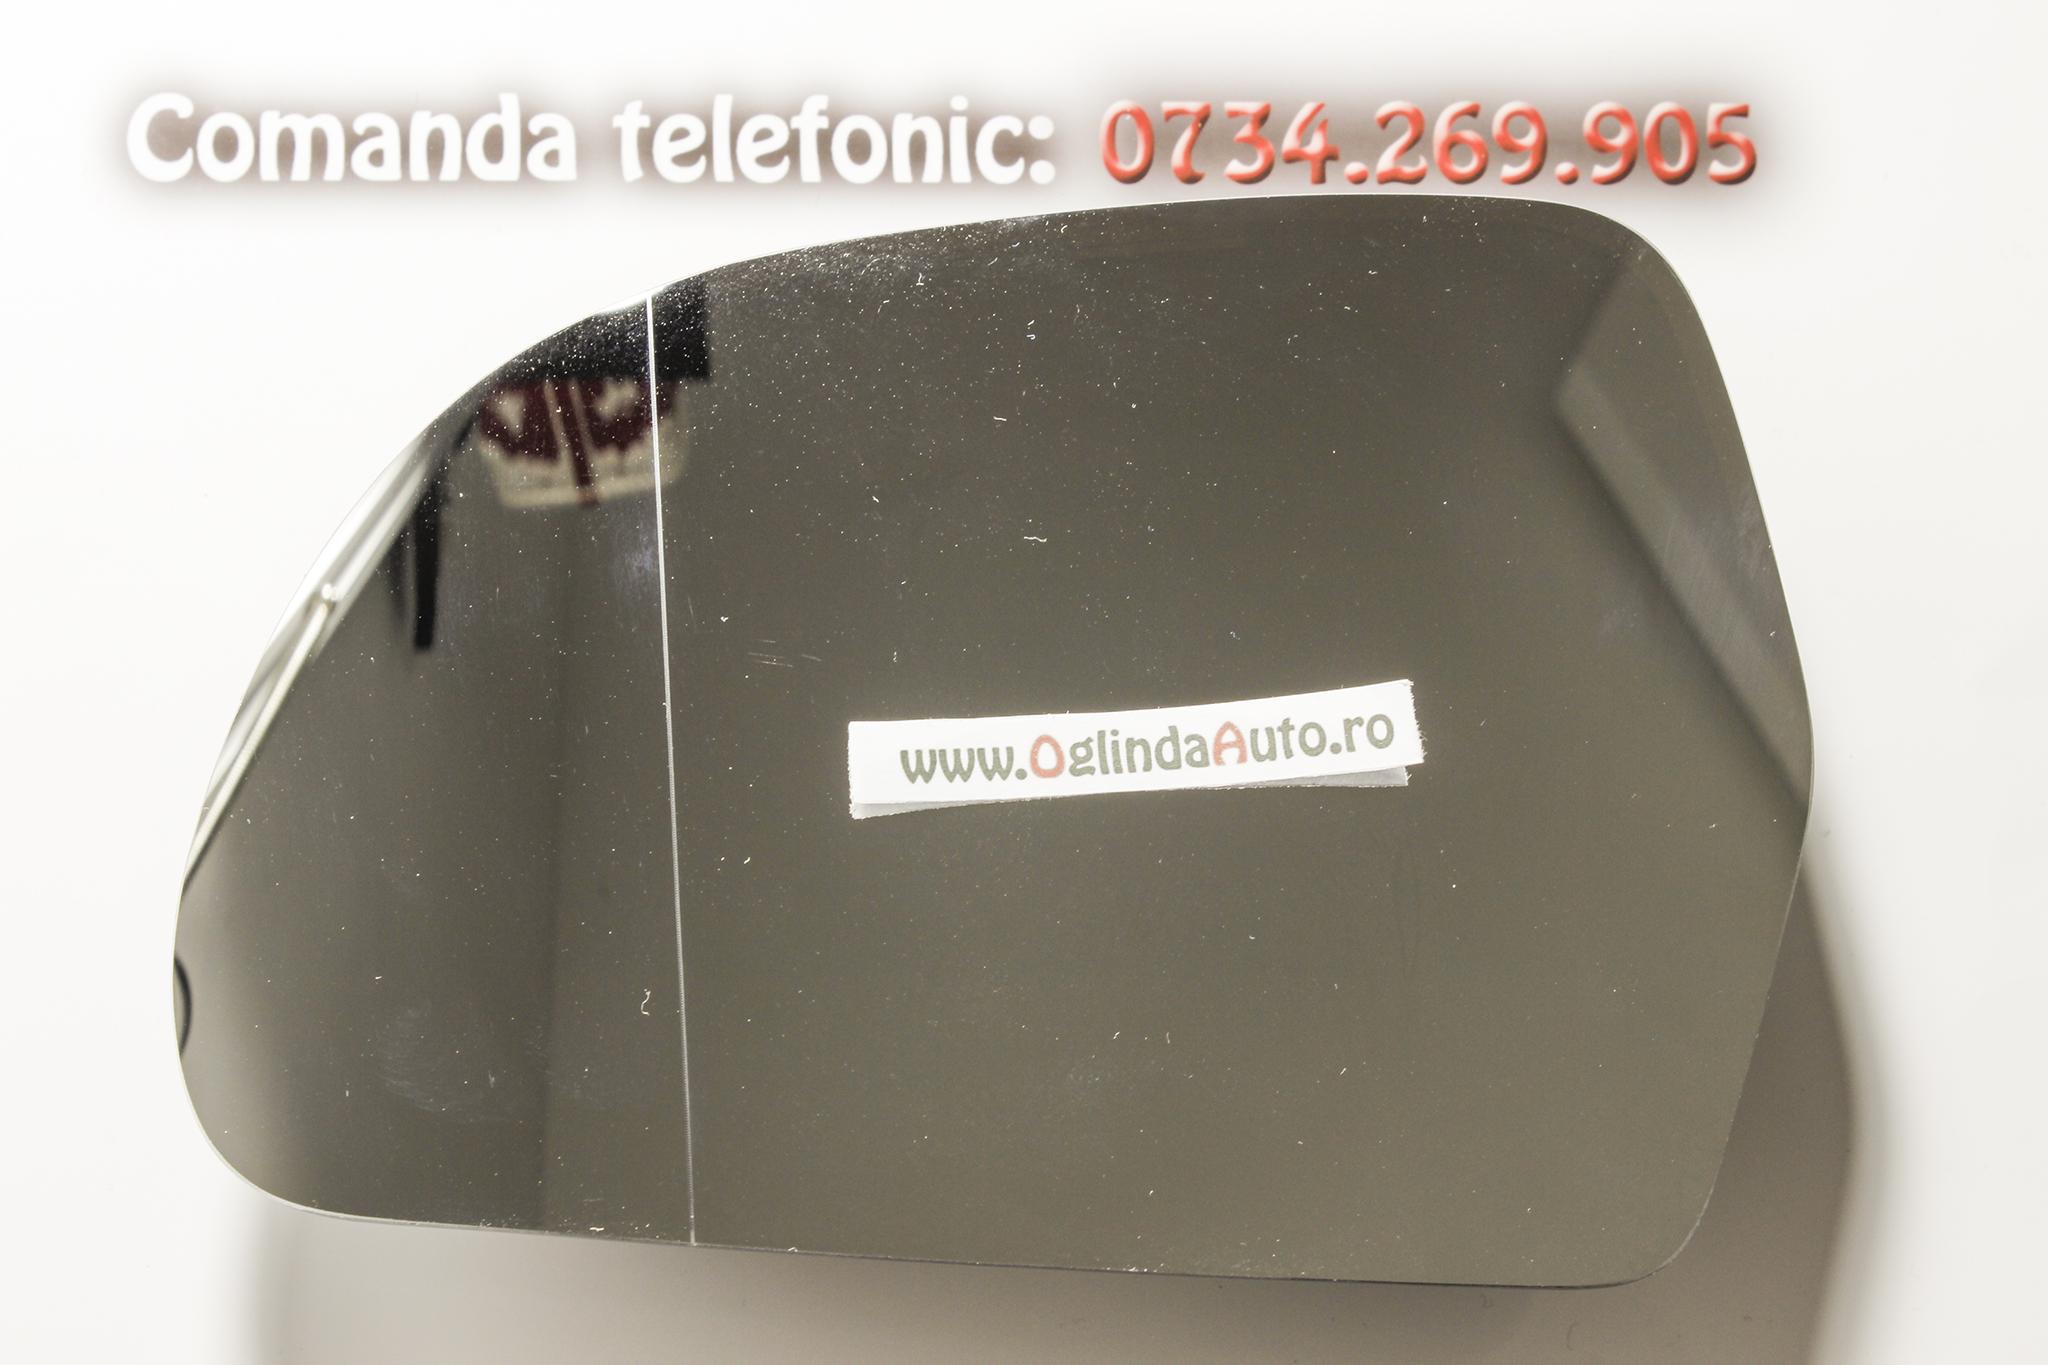 Geam oglinda stanga cu incalzire Skoda Octavia II Facelift an 2009-2013